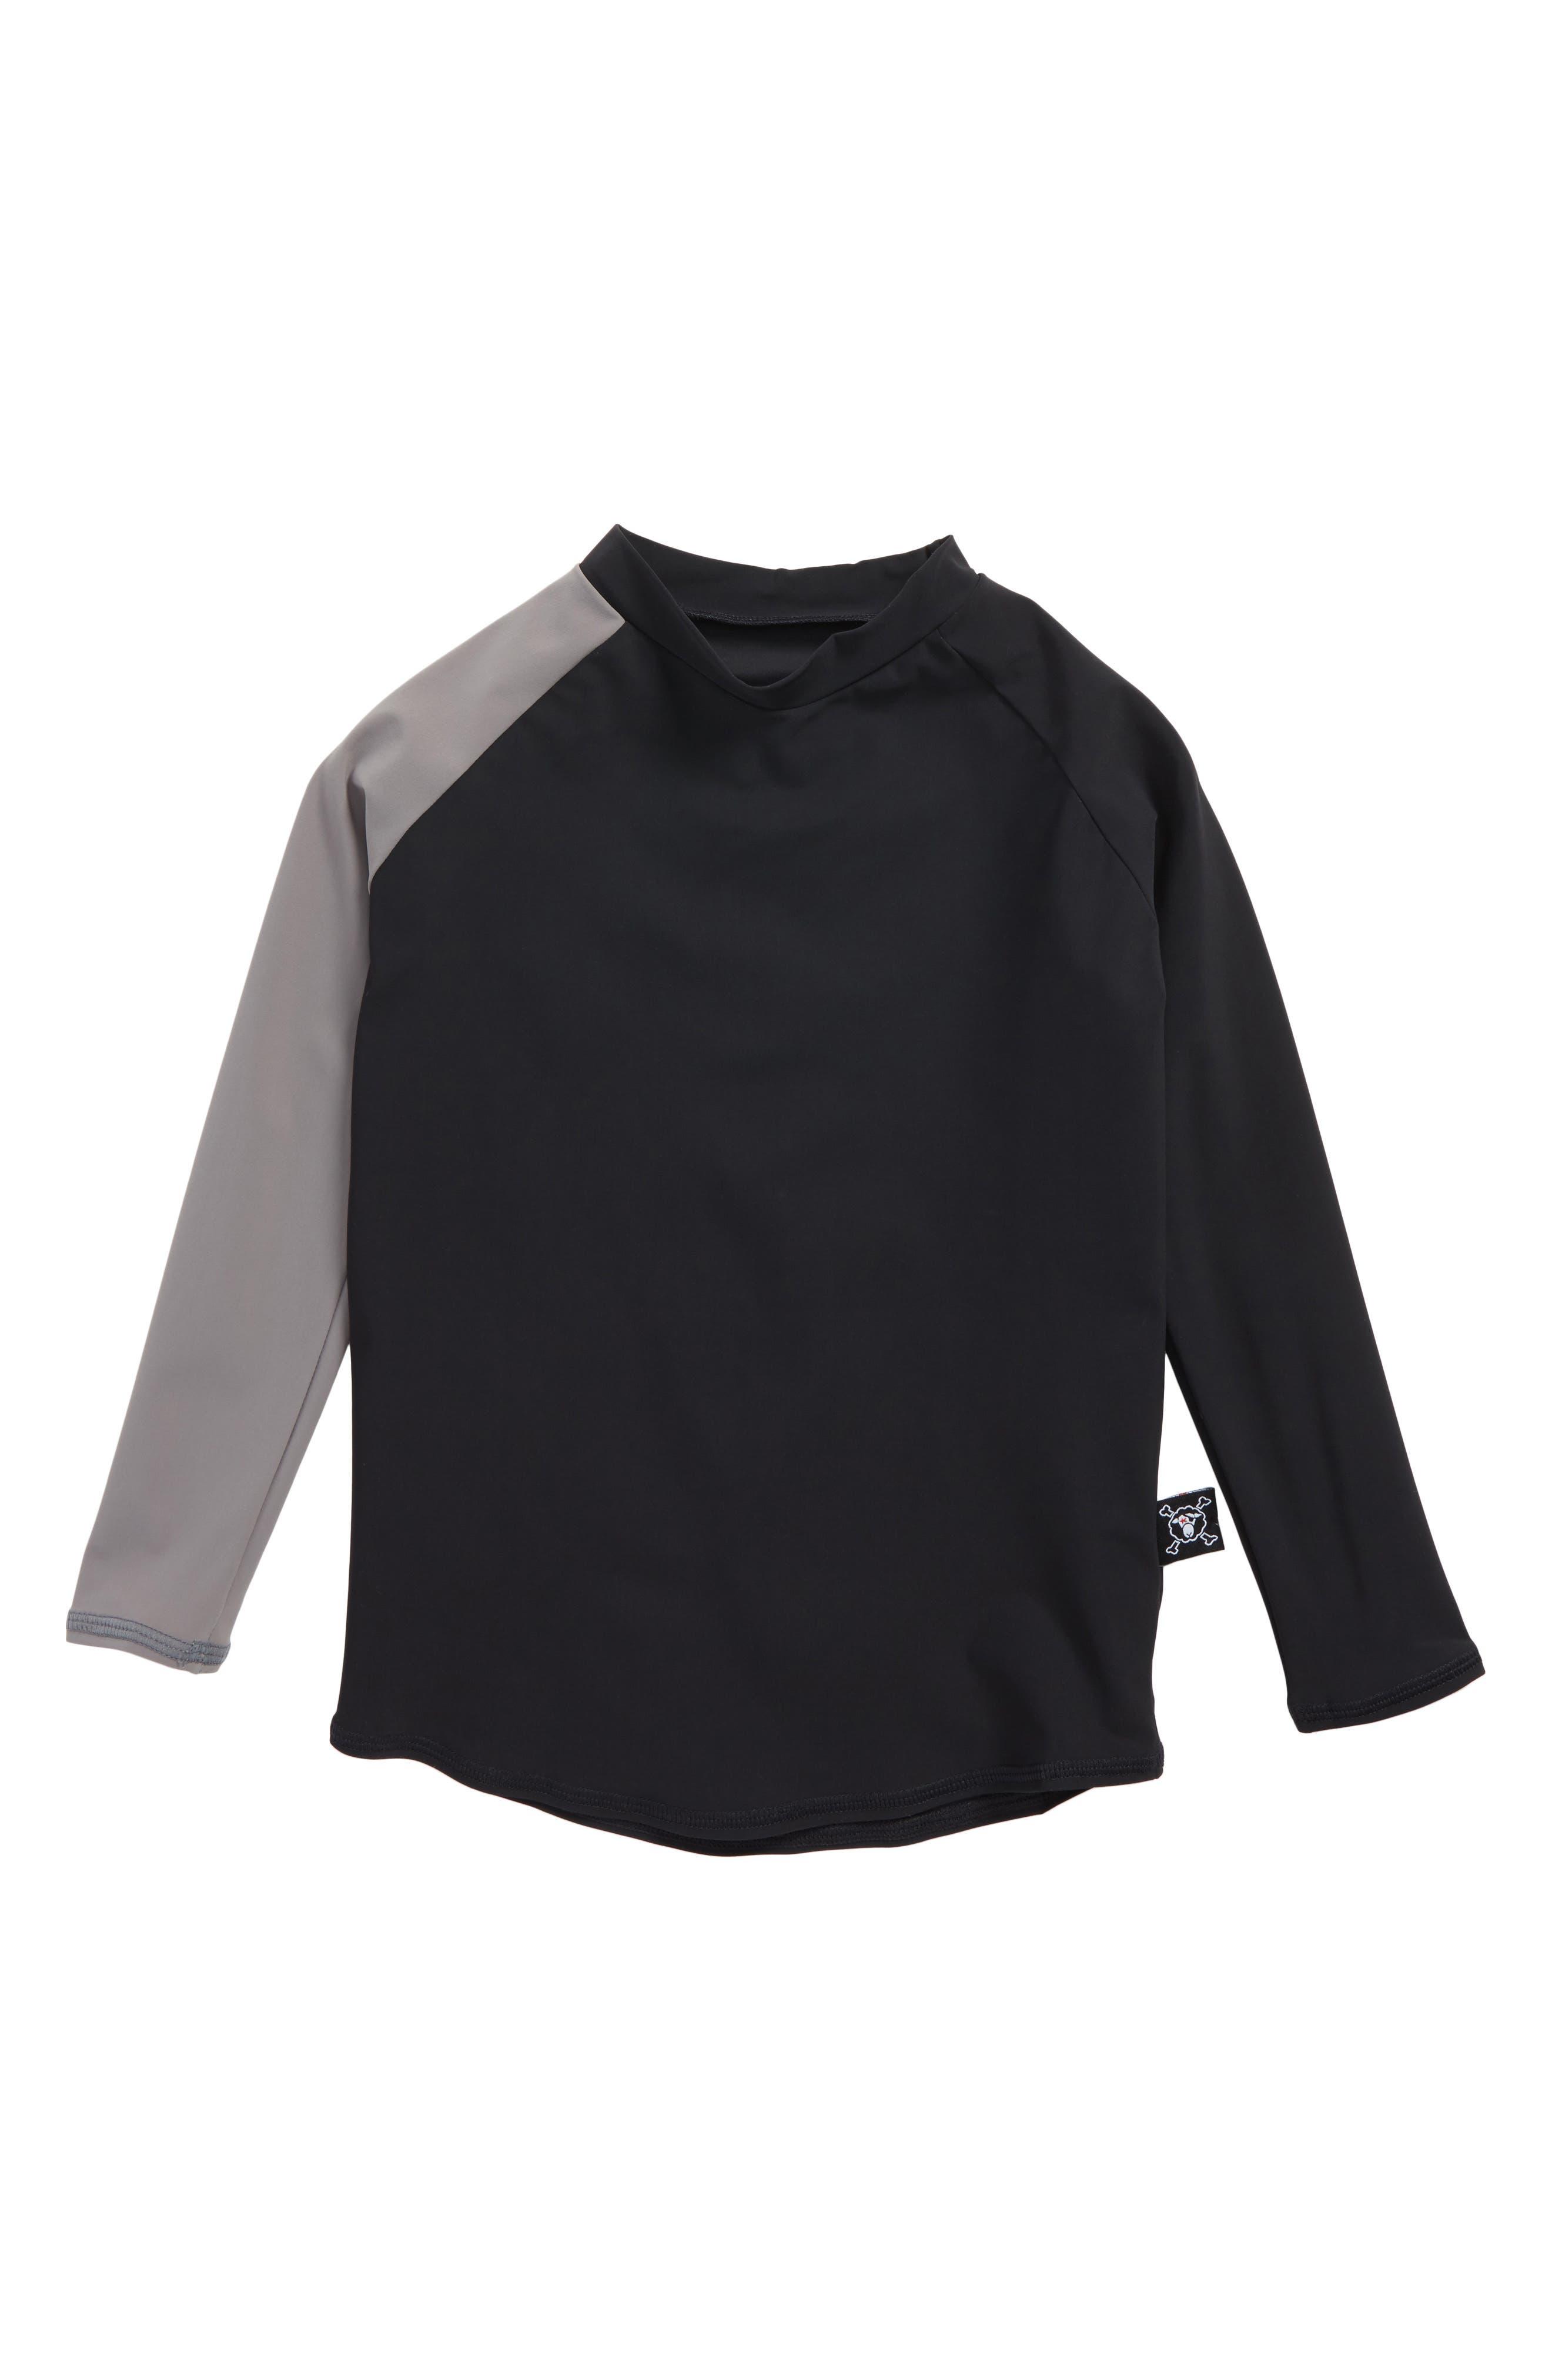 Long Sleeve Rashguard,                         Main,                         color, Black/ Dark Grey